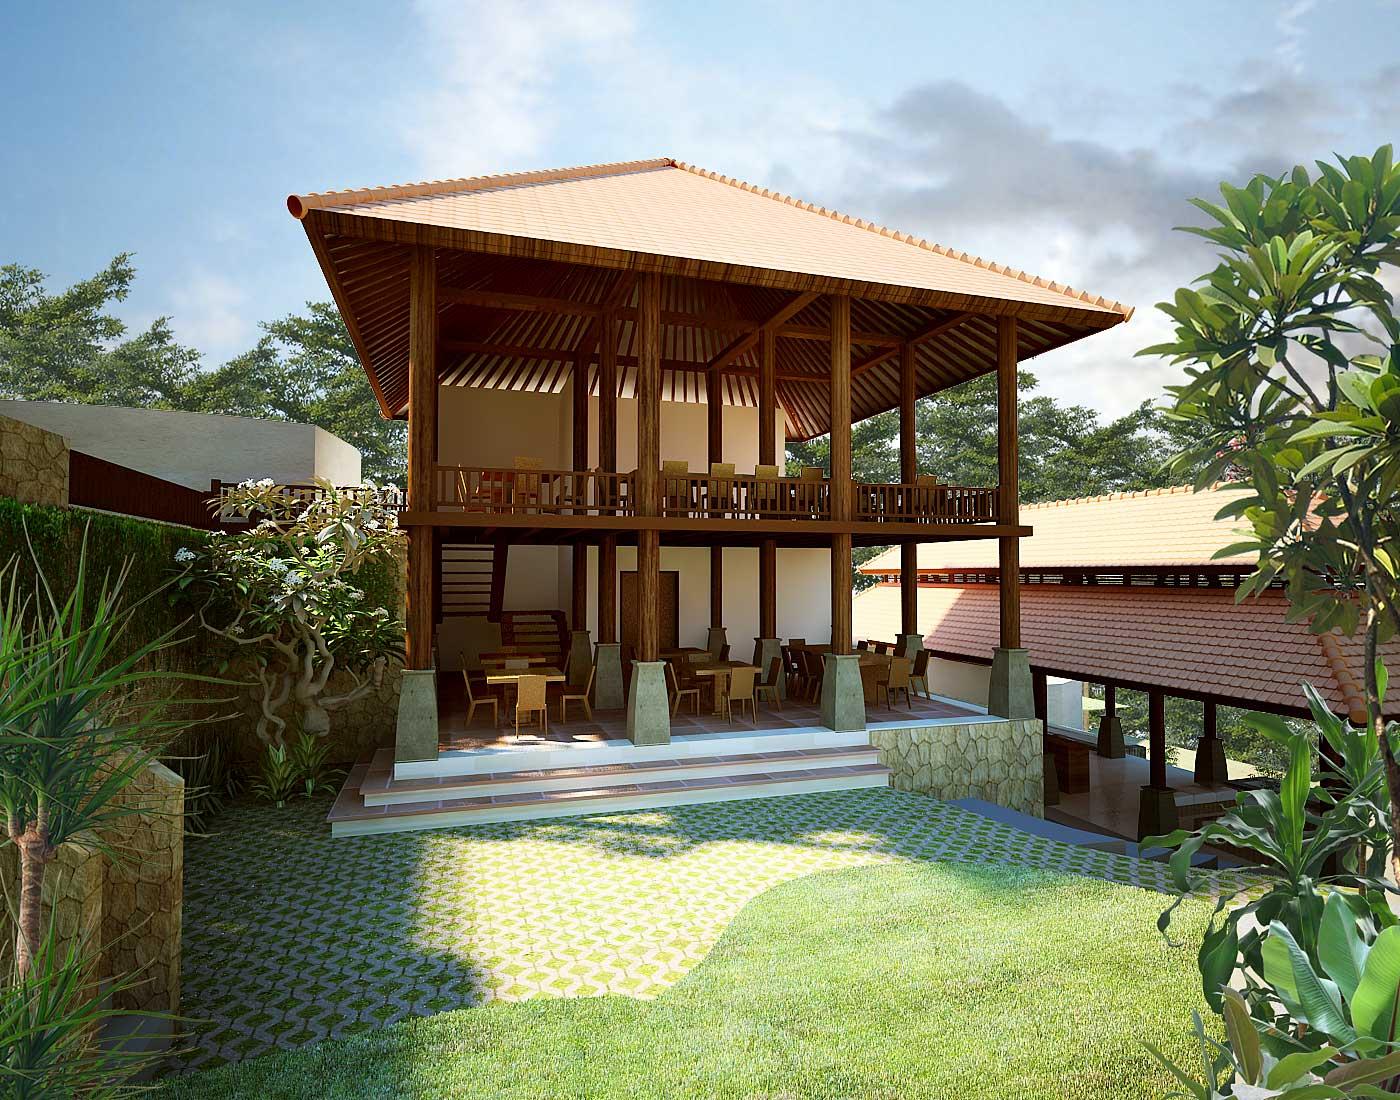 desain villa bambu desain rumah